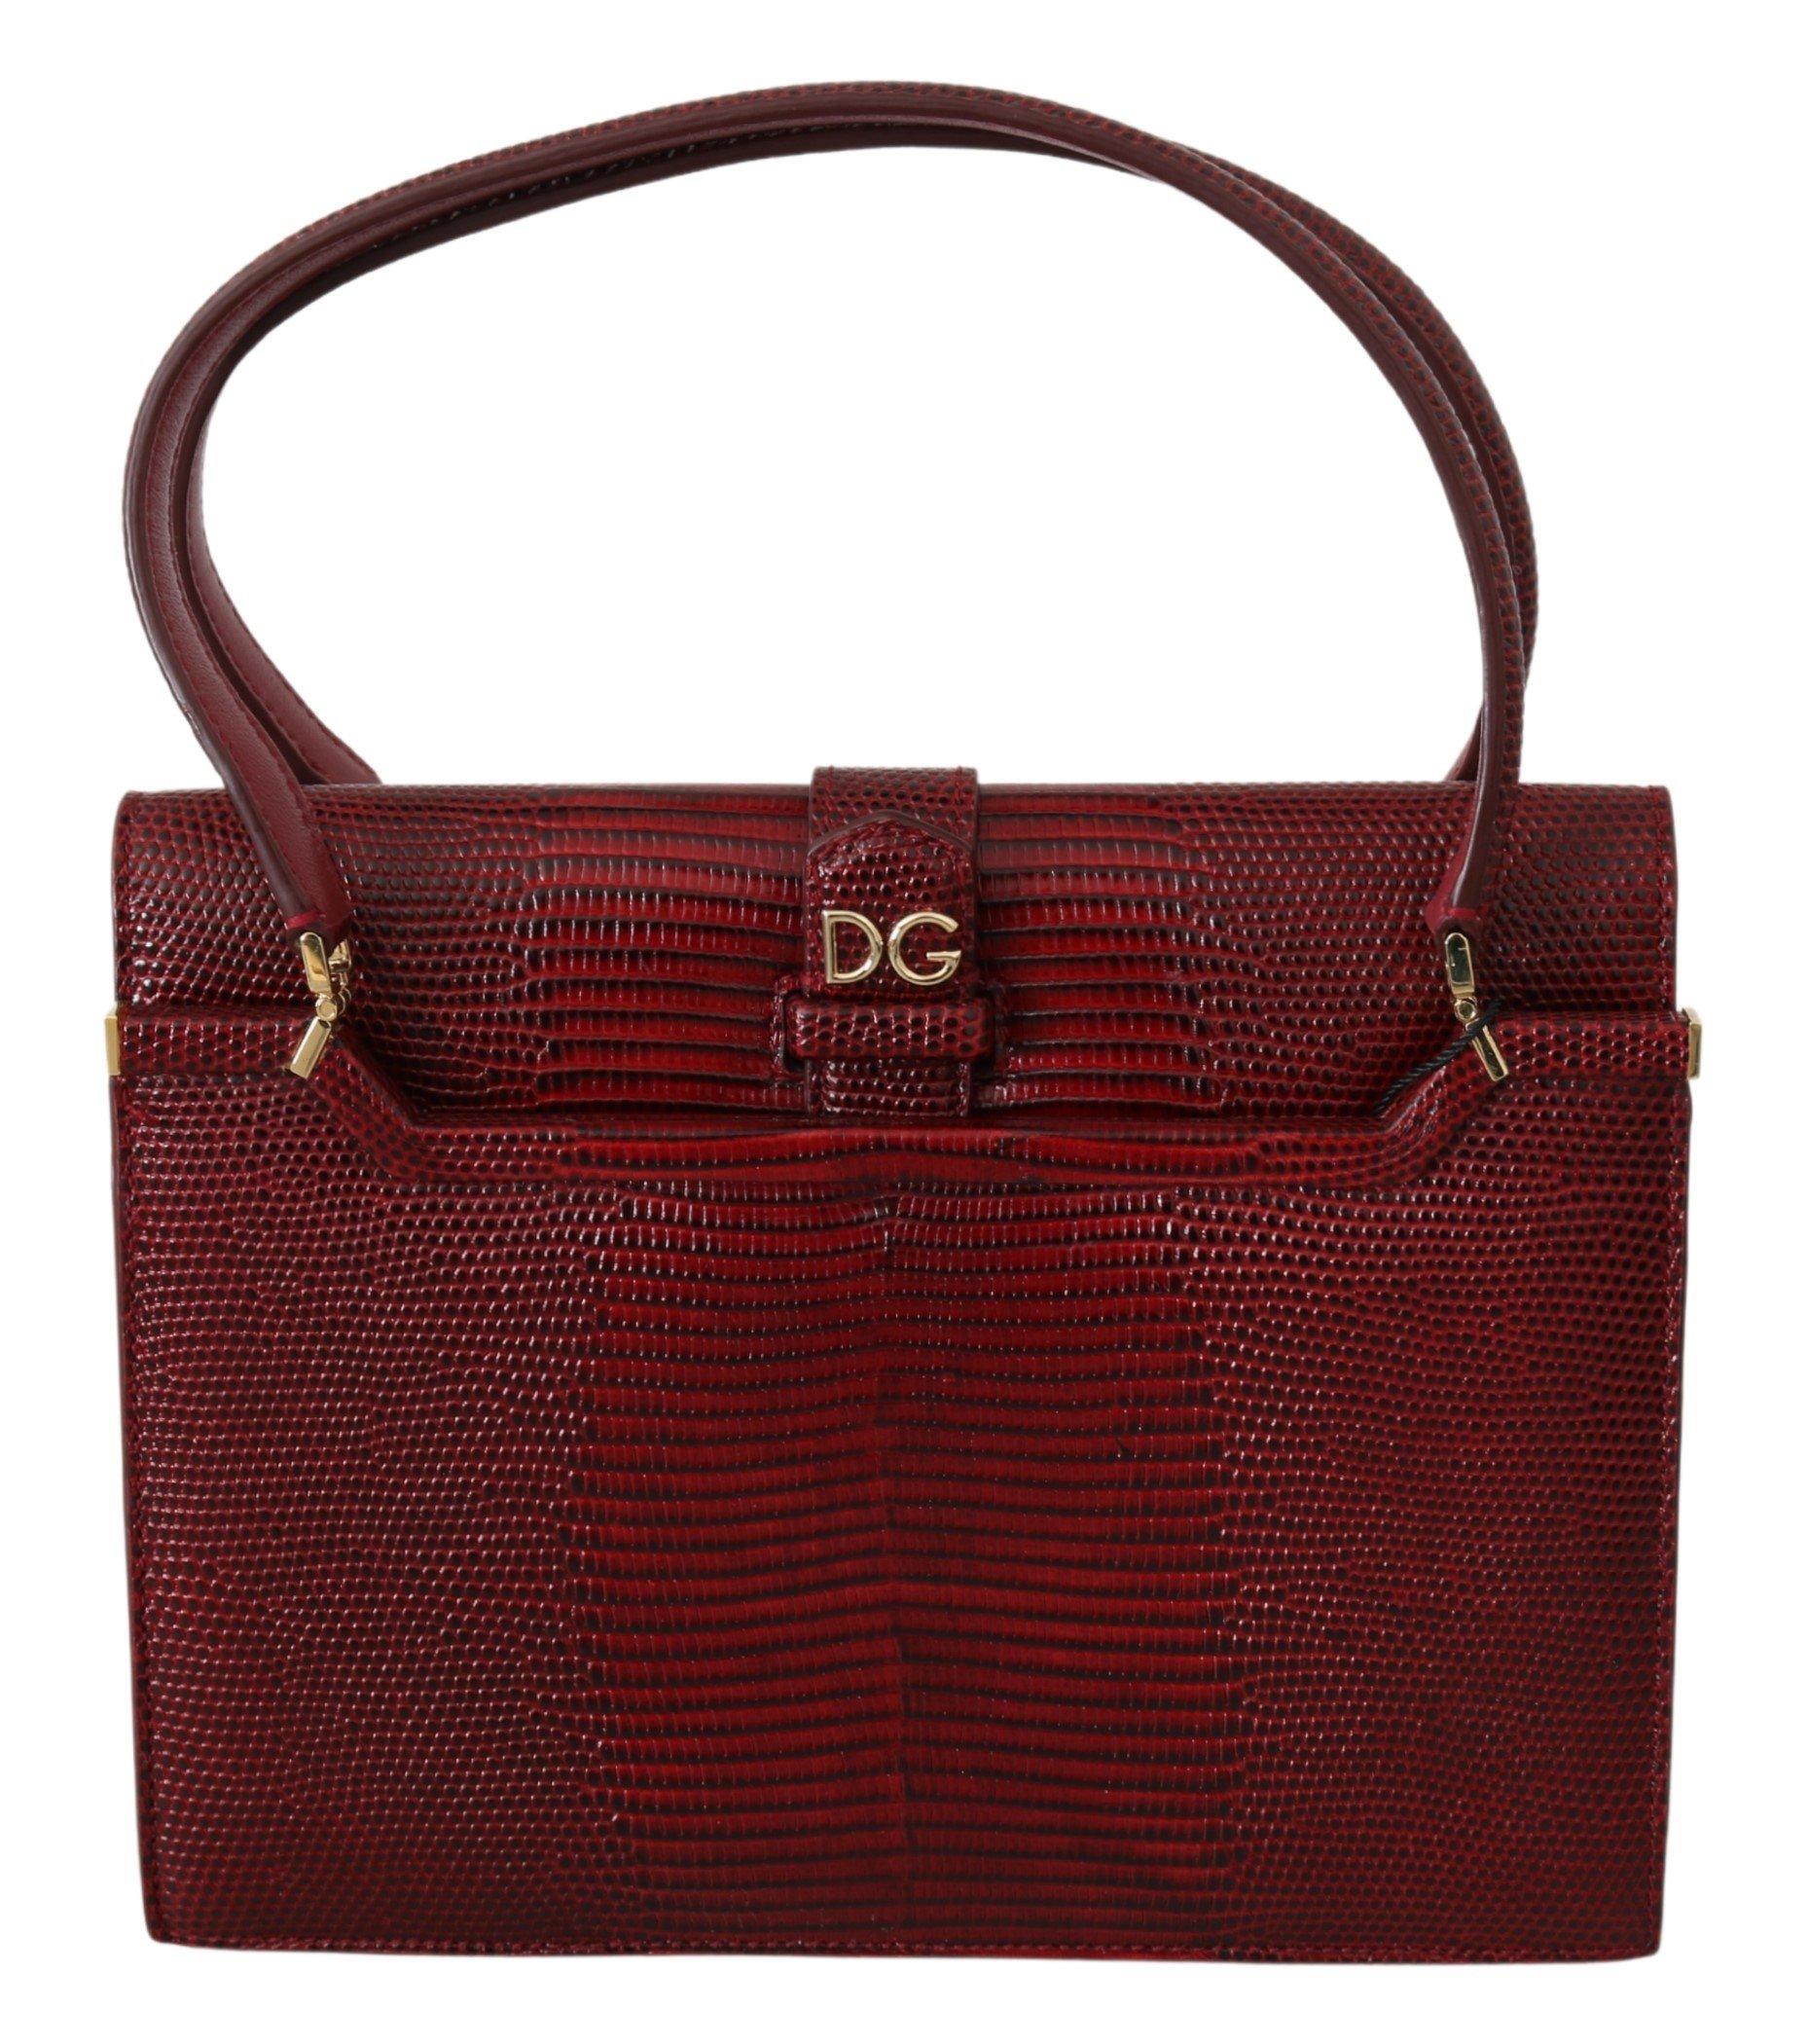 Dolce & Gabbana Women's DG Logo INGRID Handbag Bordeaux VAS9812